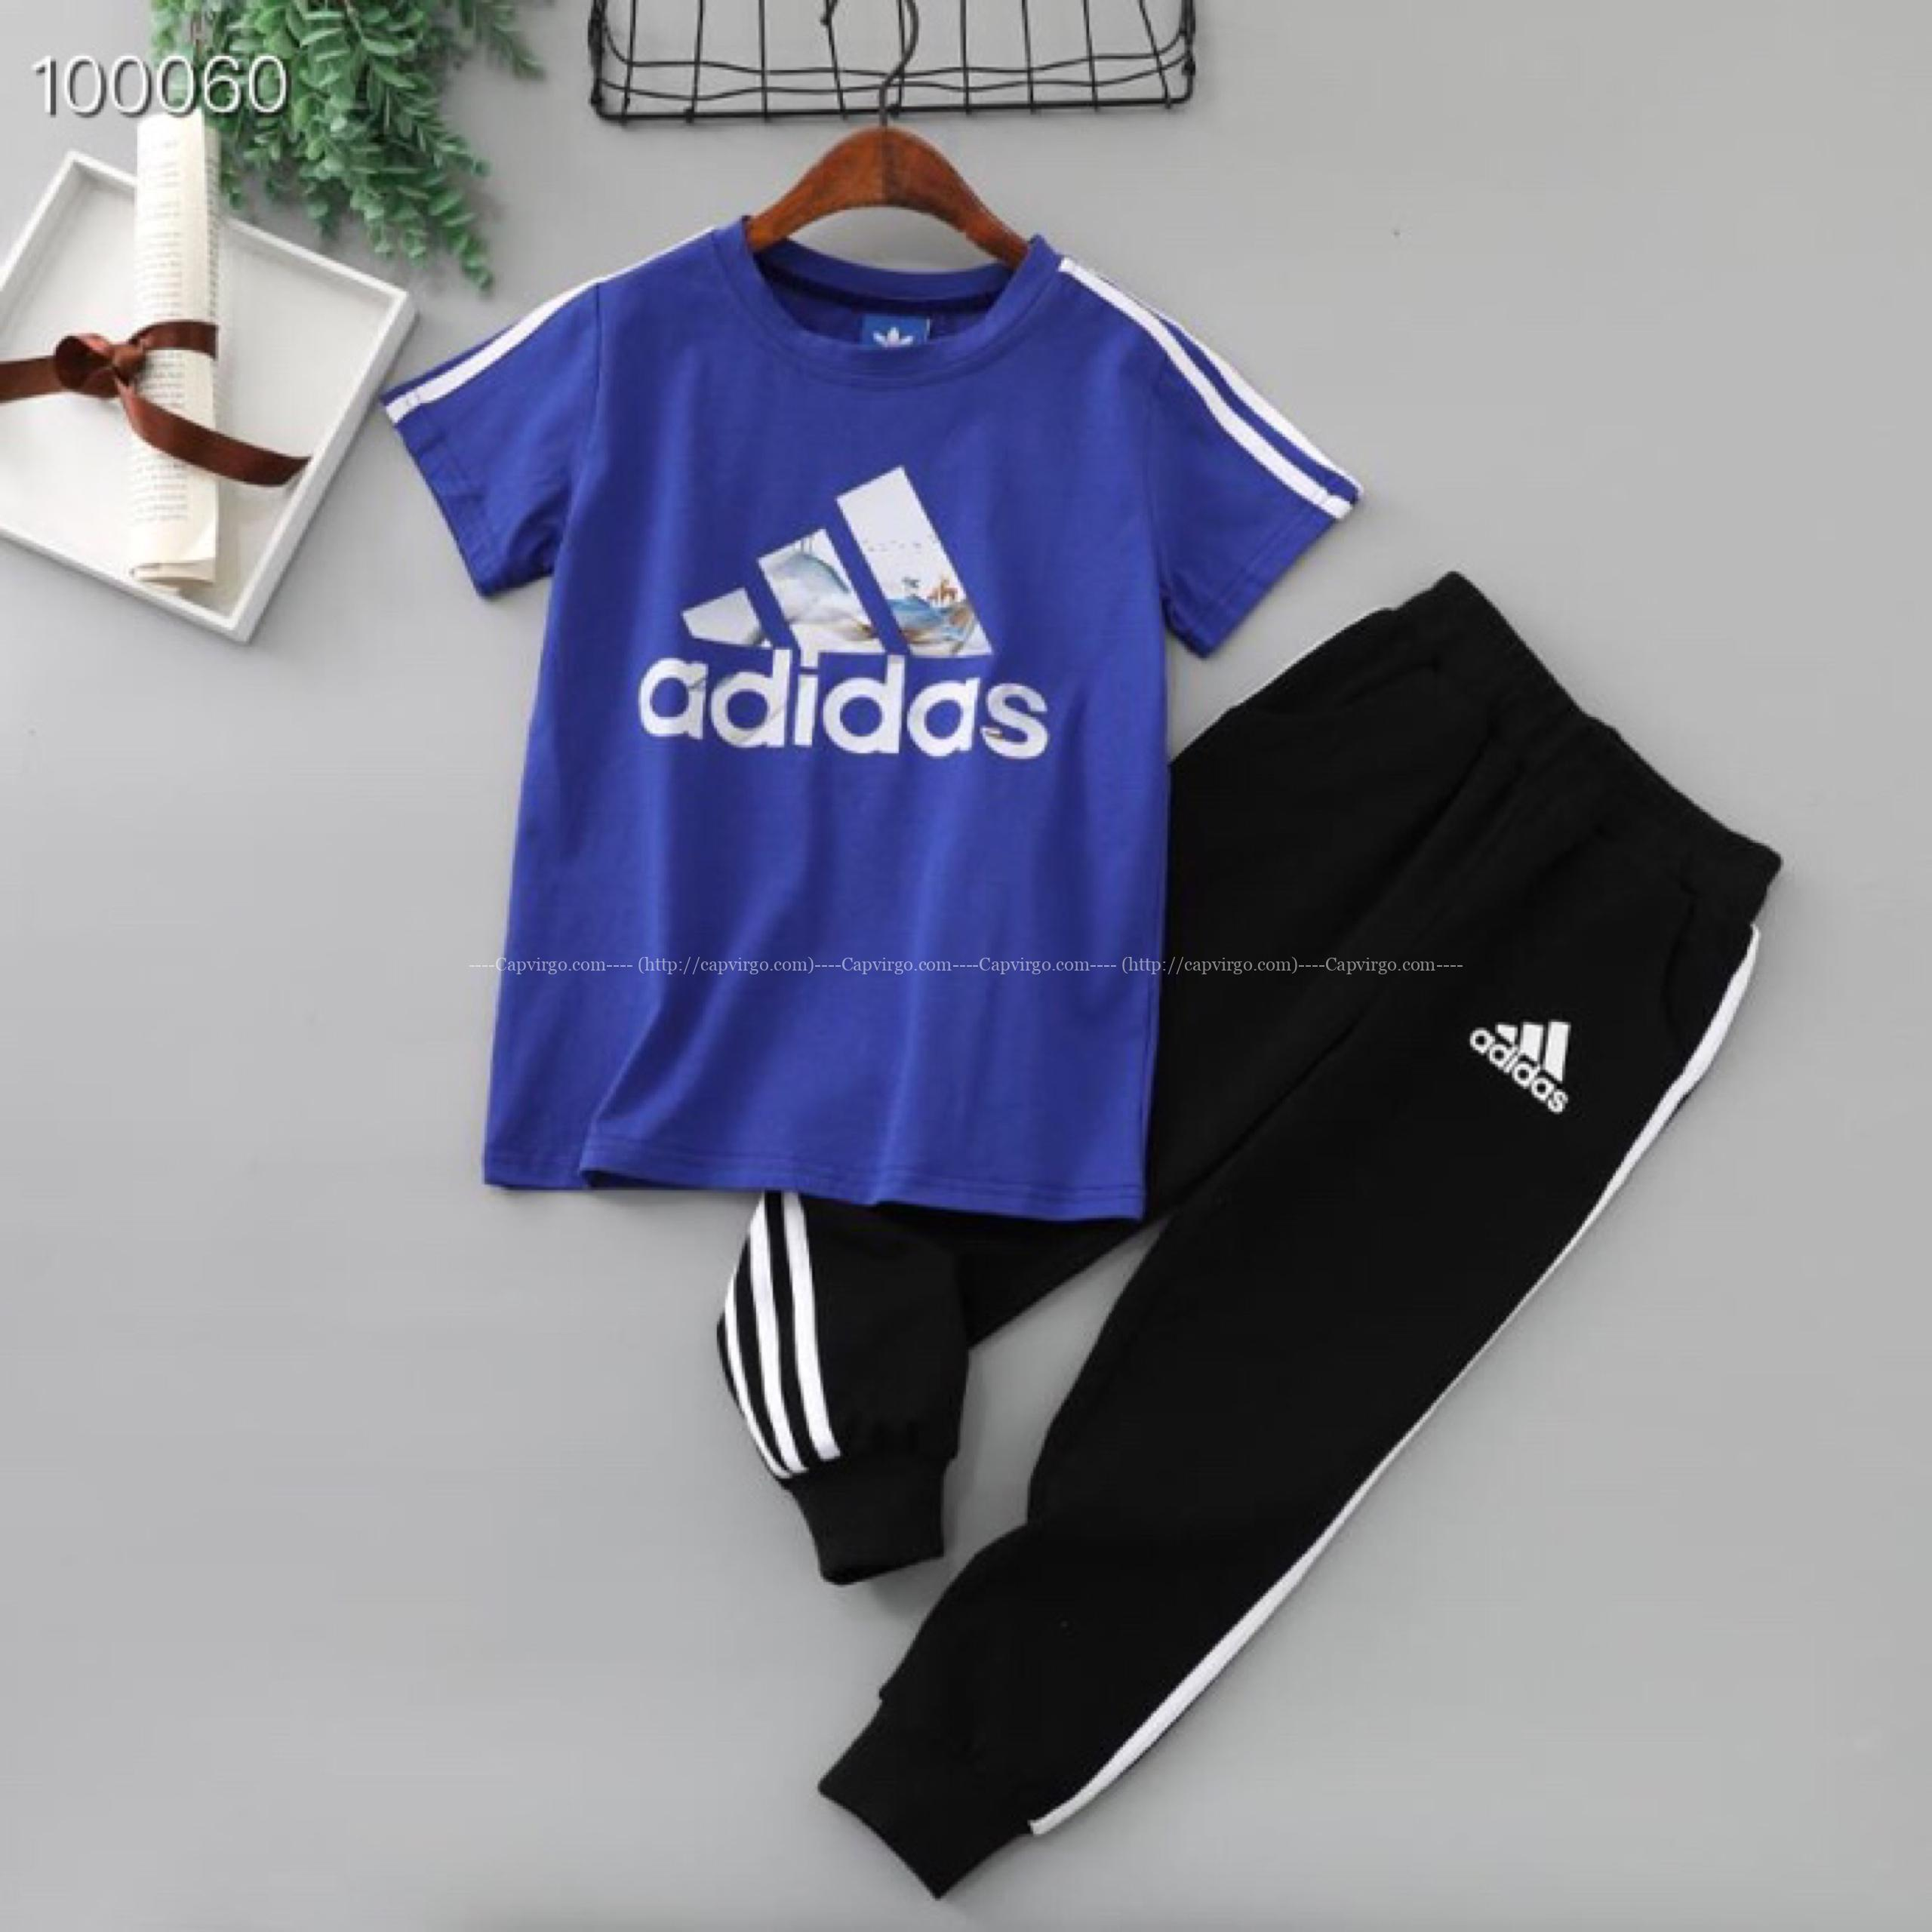 Bộ quần áo adidas trẻ em P850110170